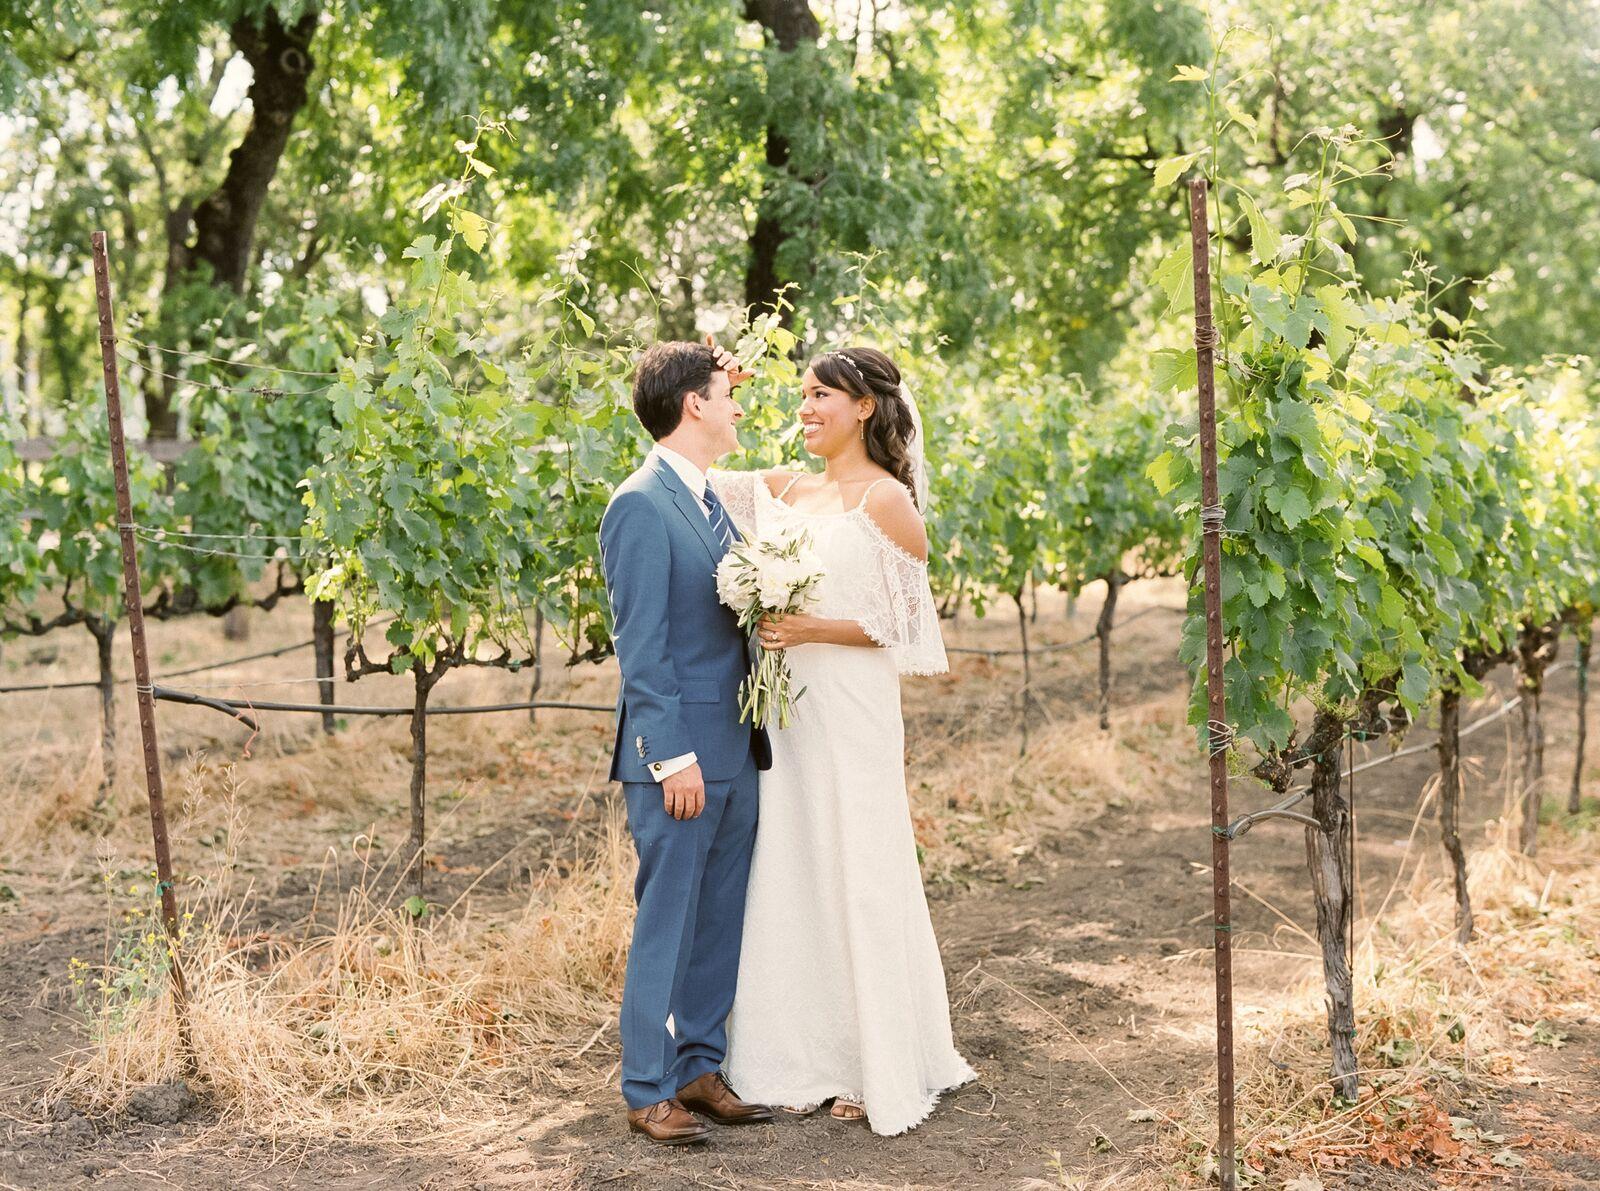 bohemian-lace-wedding-dress-4.jpg